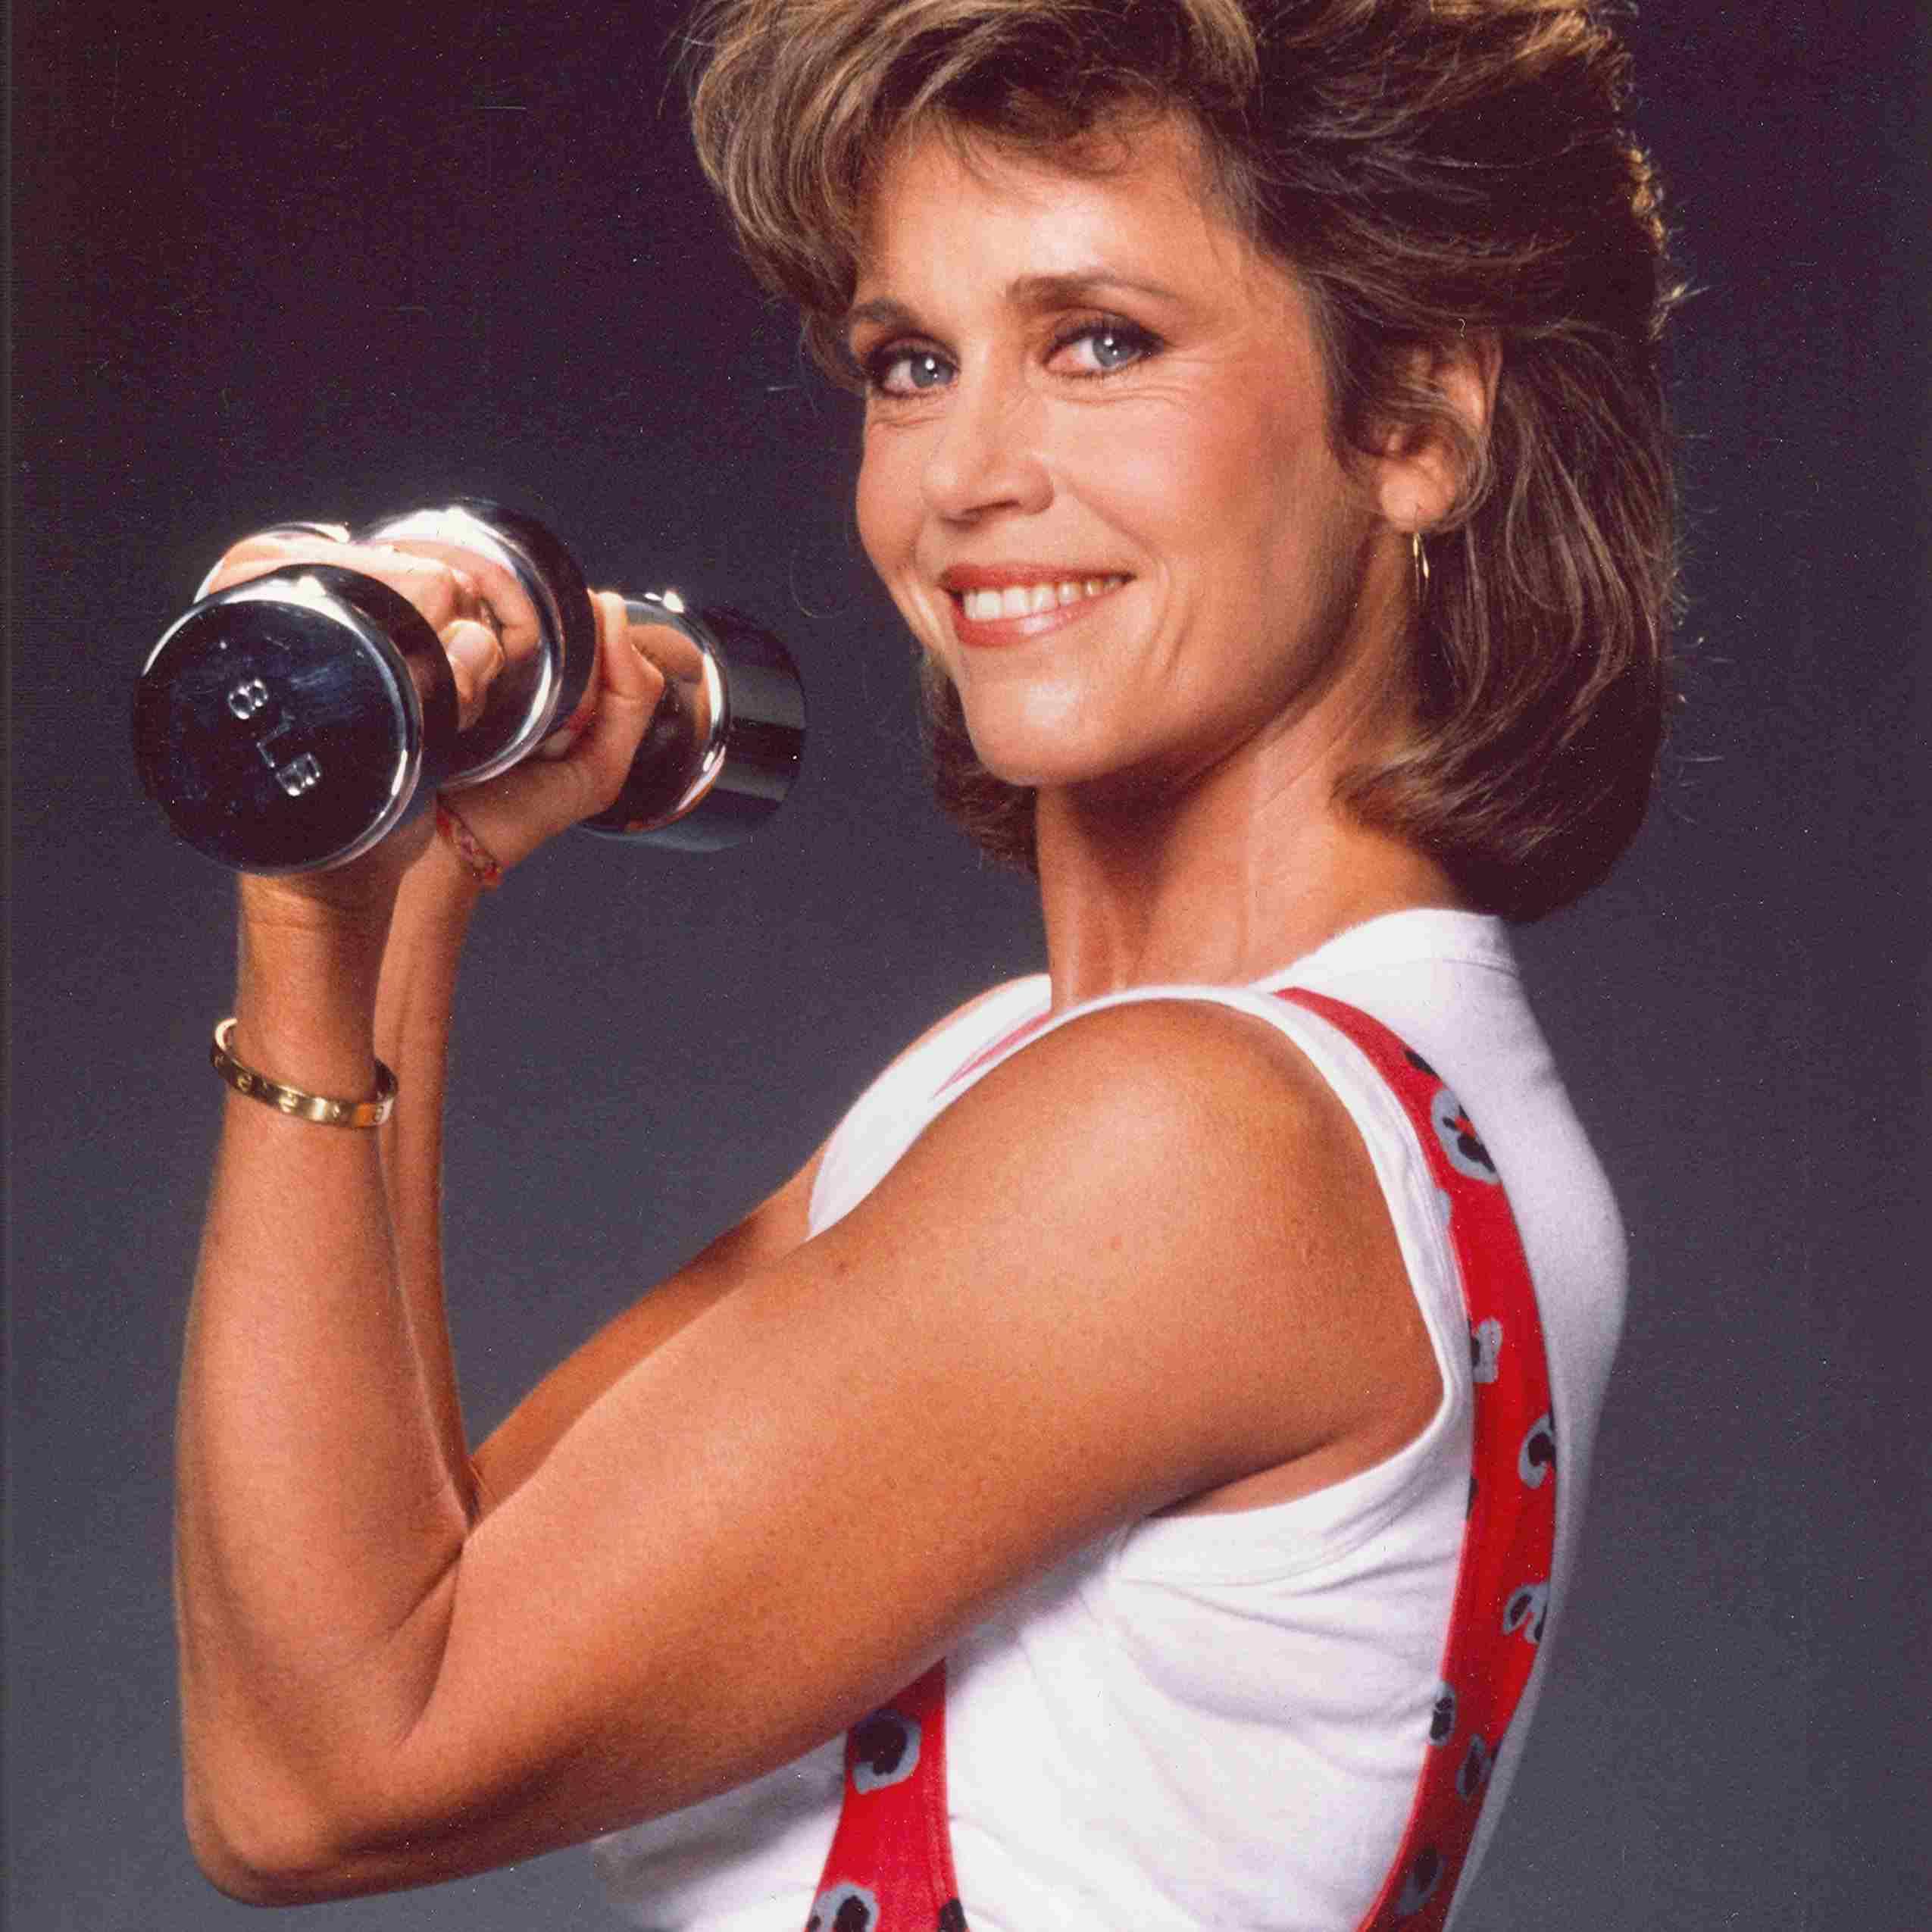 Jane Fonda circa 1990